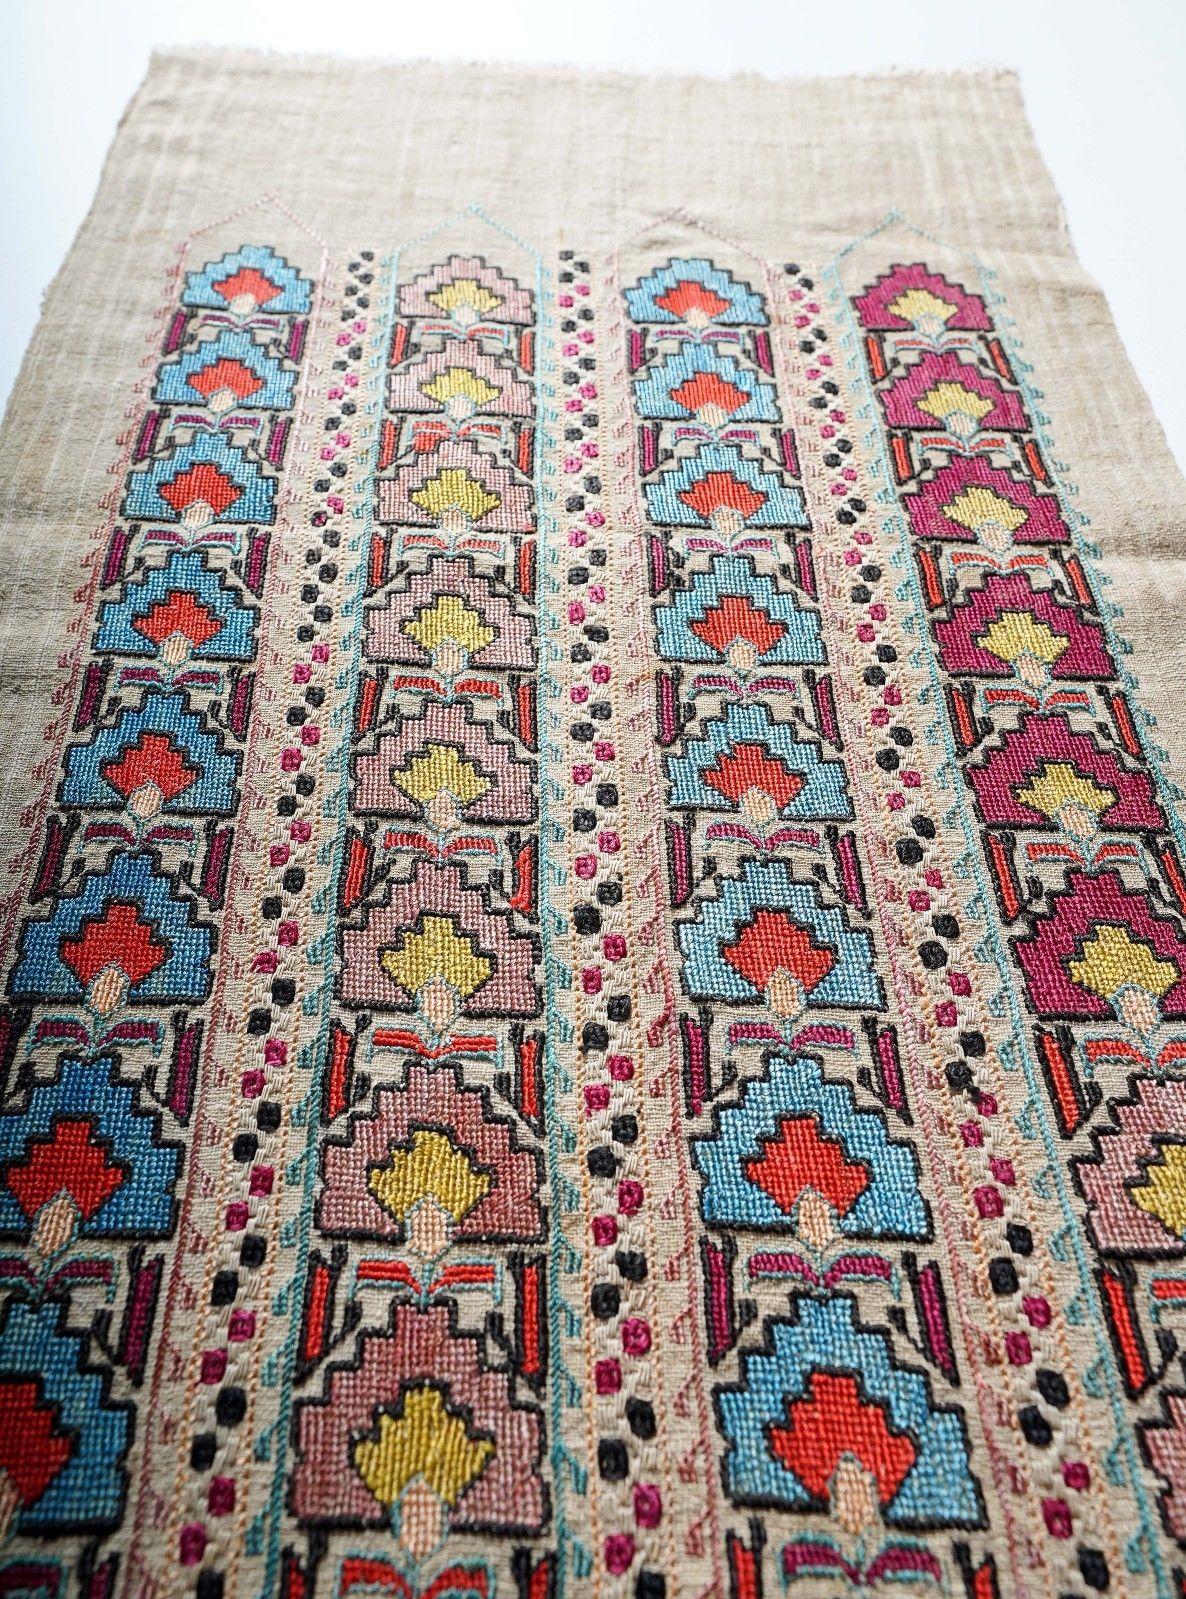 Antique Ottoman Turkish Armenian Greek Yaglik Silk Mihrab Embroidery Textile 375 00 Here Is An Unusual Xixth Century Ottoman Embr Kanavice Desenler Ortuler